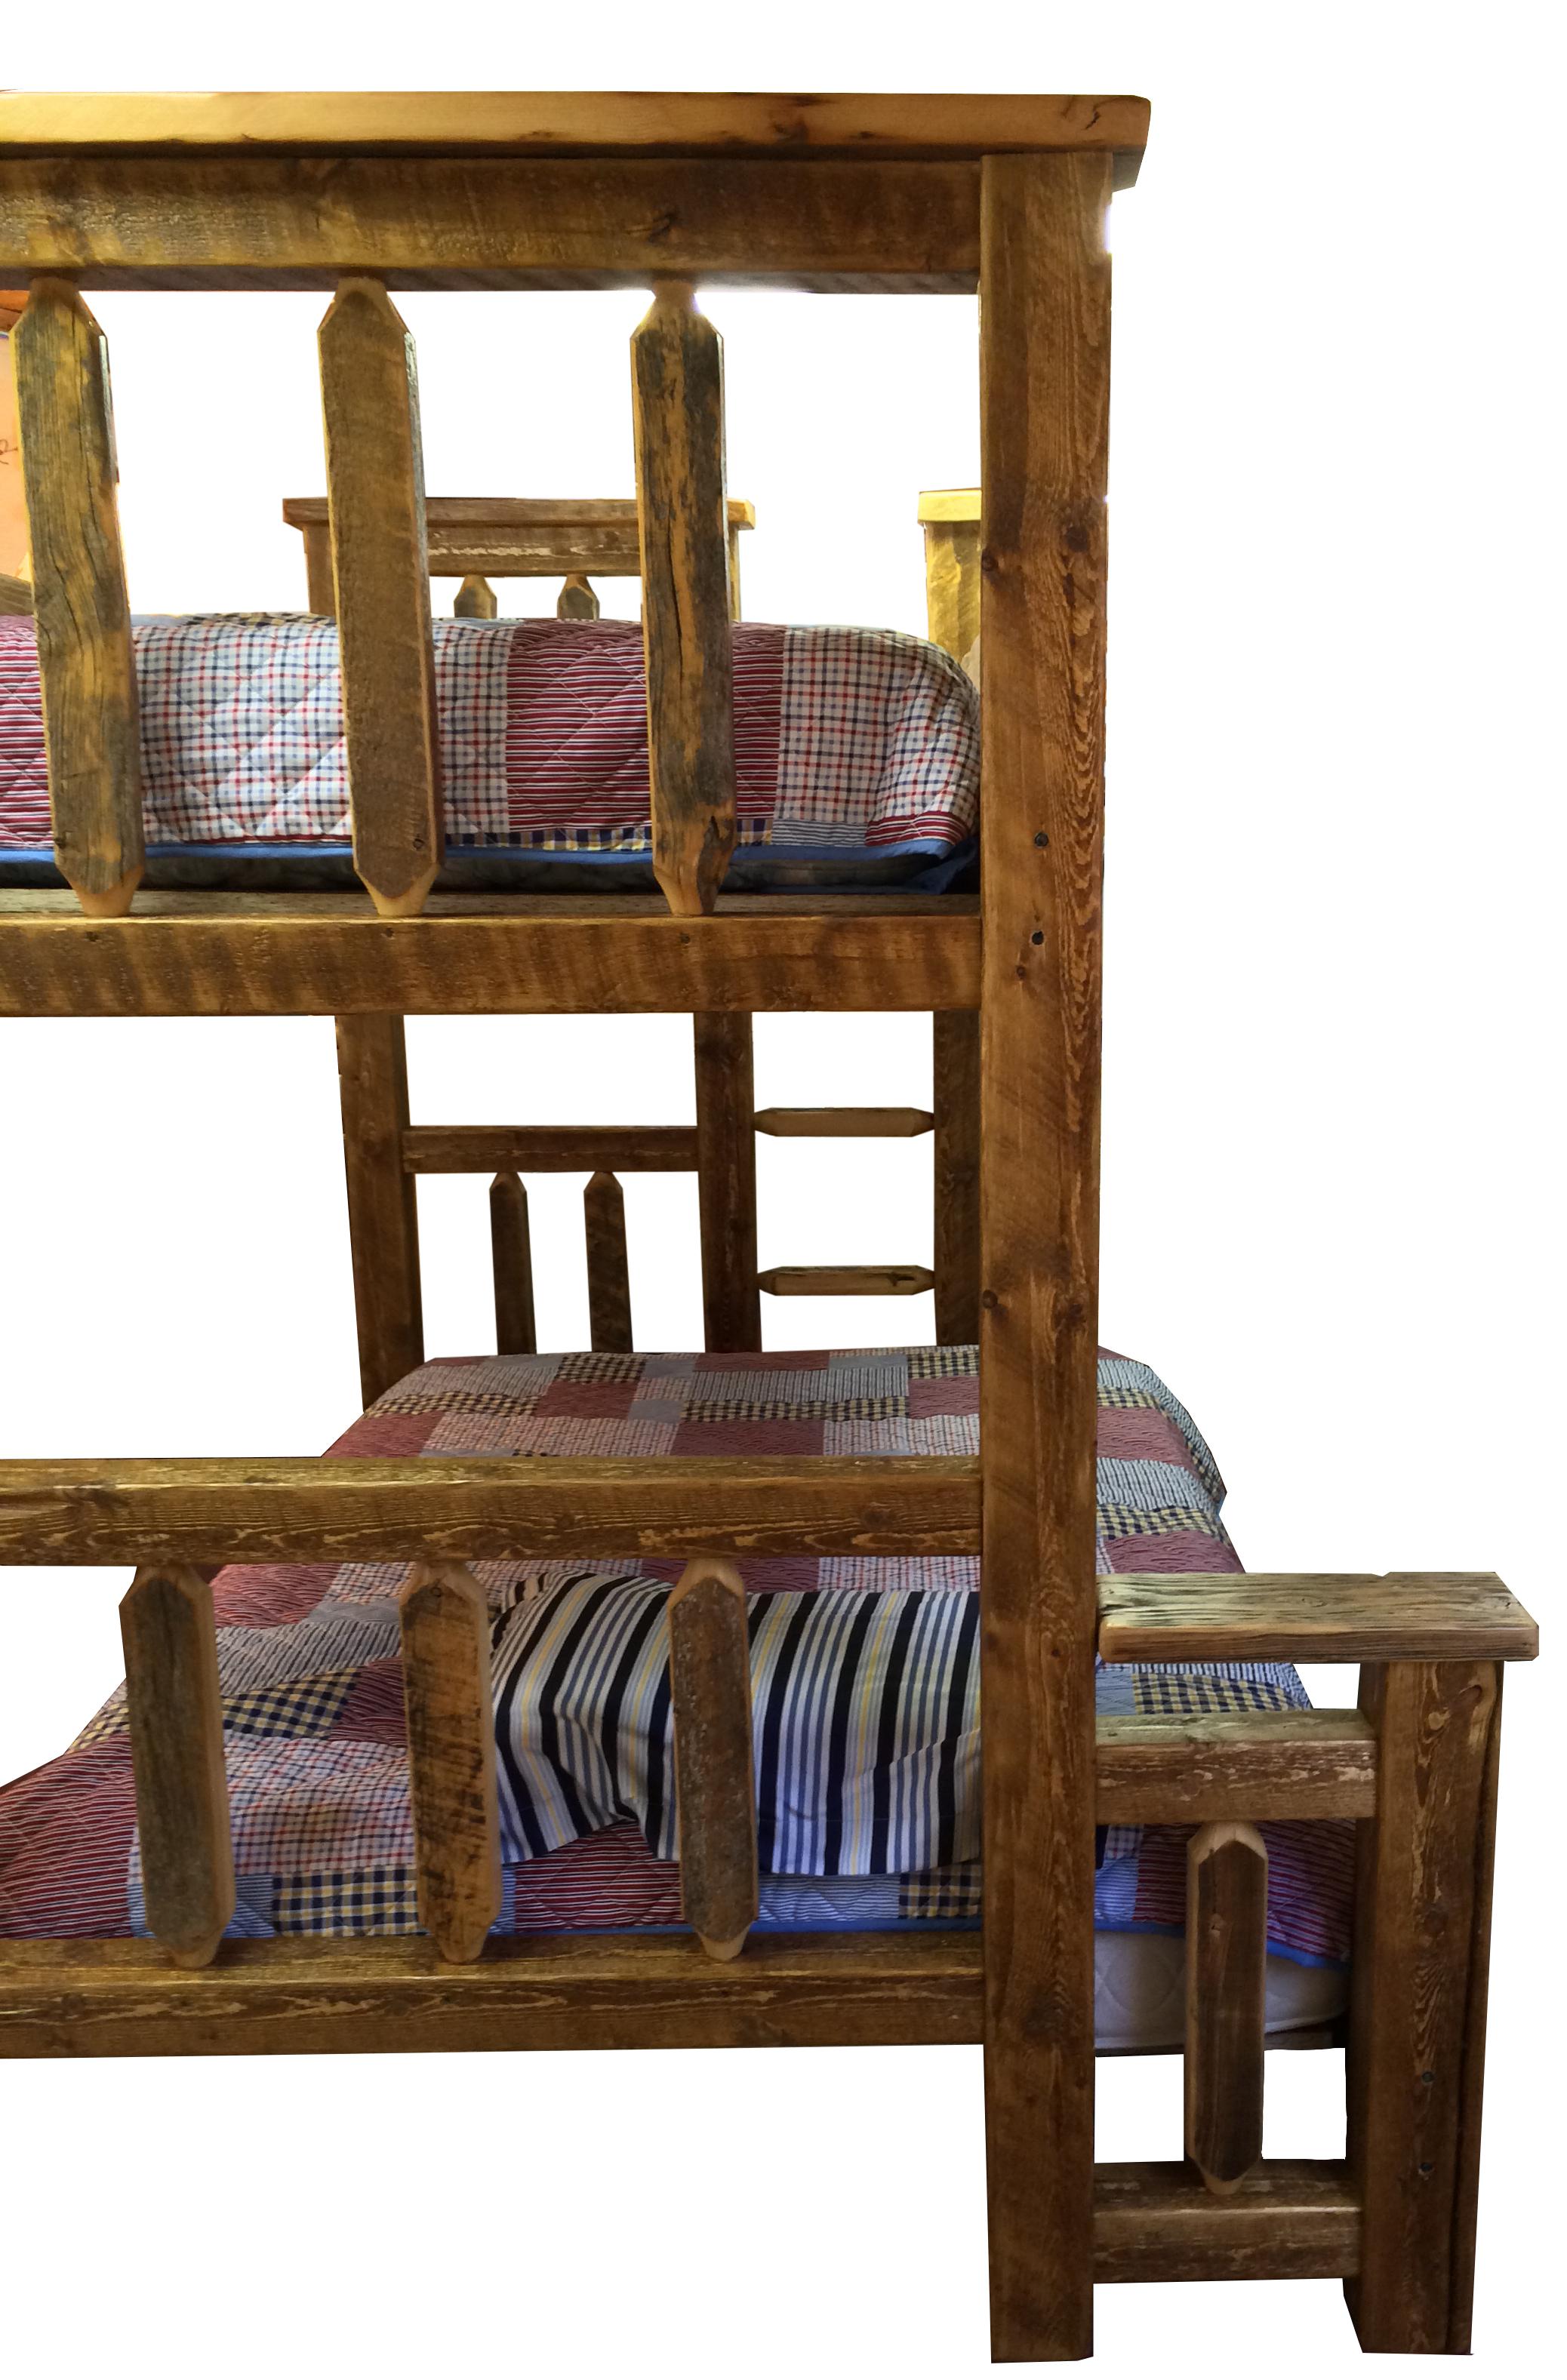 Barn Wood Bunk Bed Rustic Twin Over Twin Breck Bears